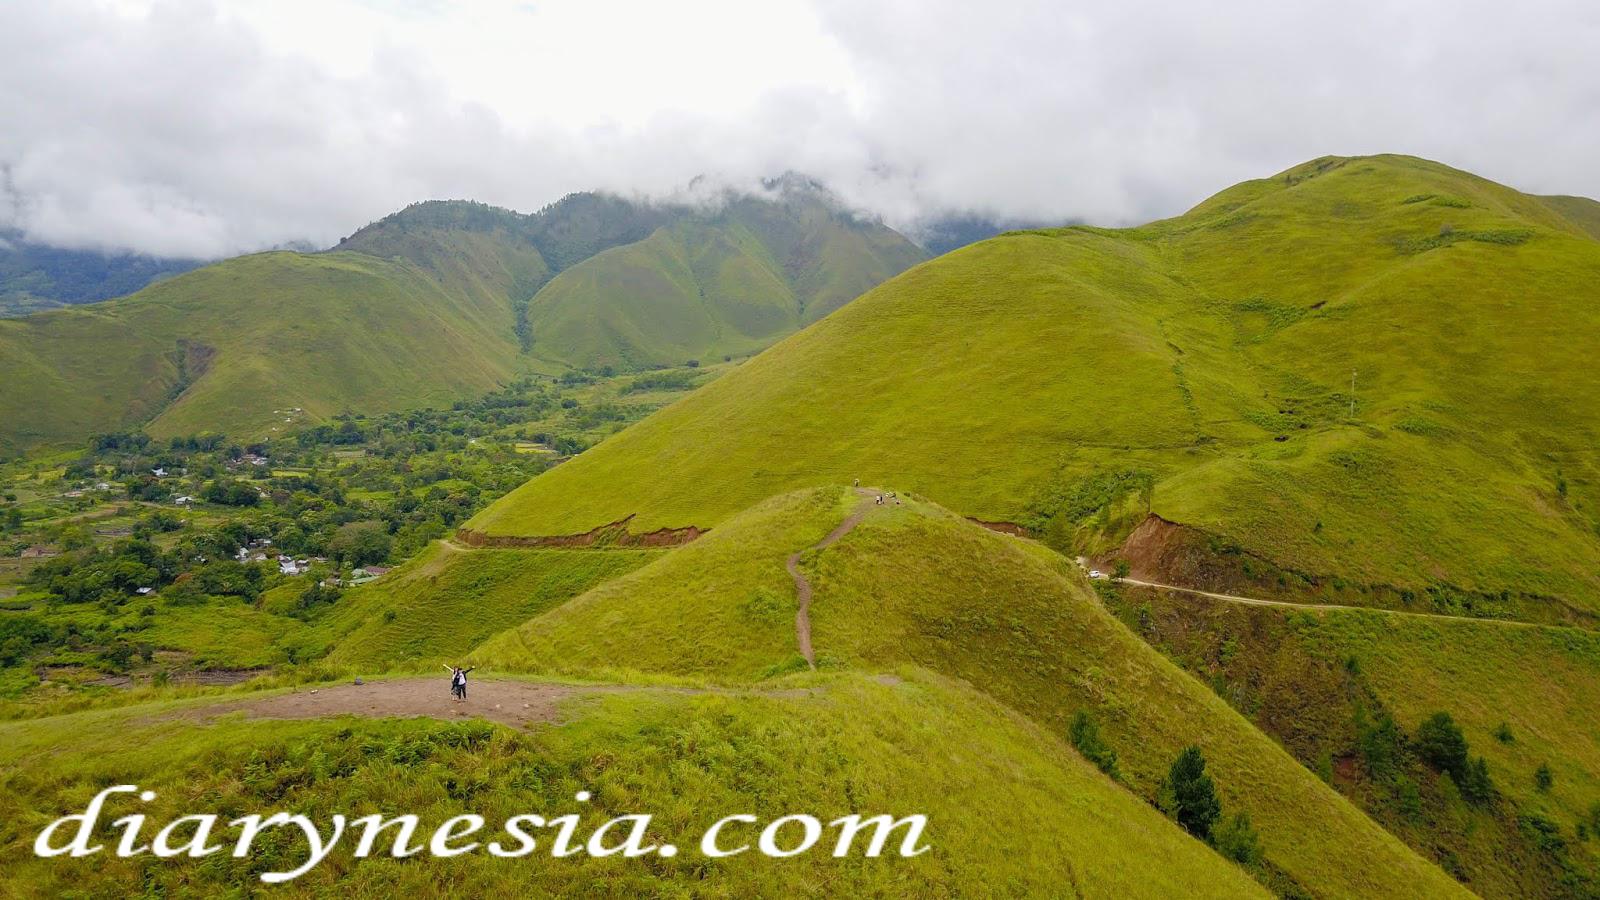 north sumatra tourism, sumatra island, toba lake, diarynesia